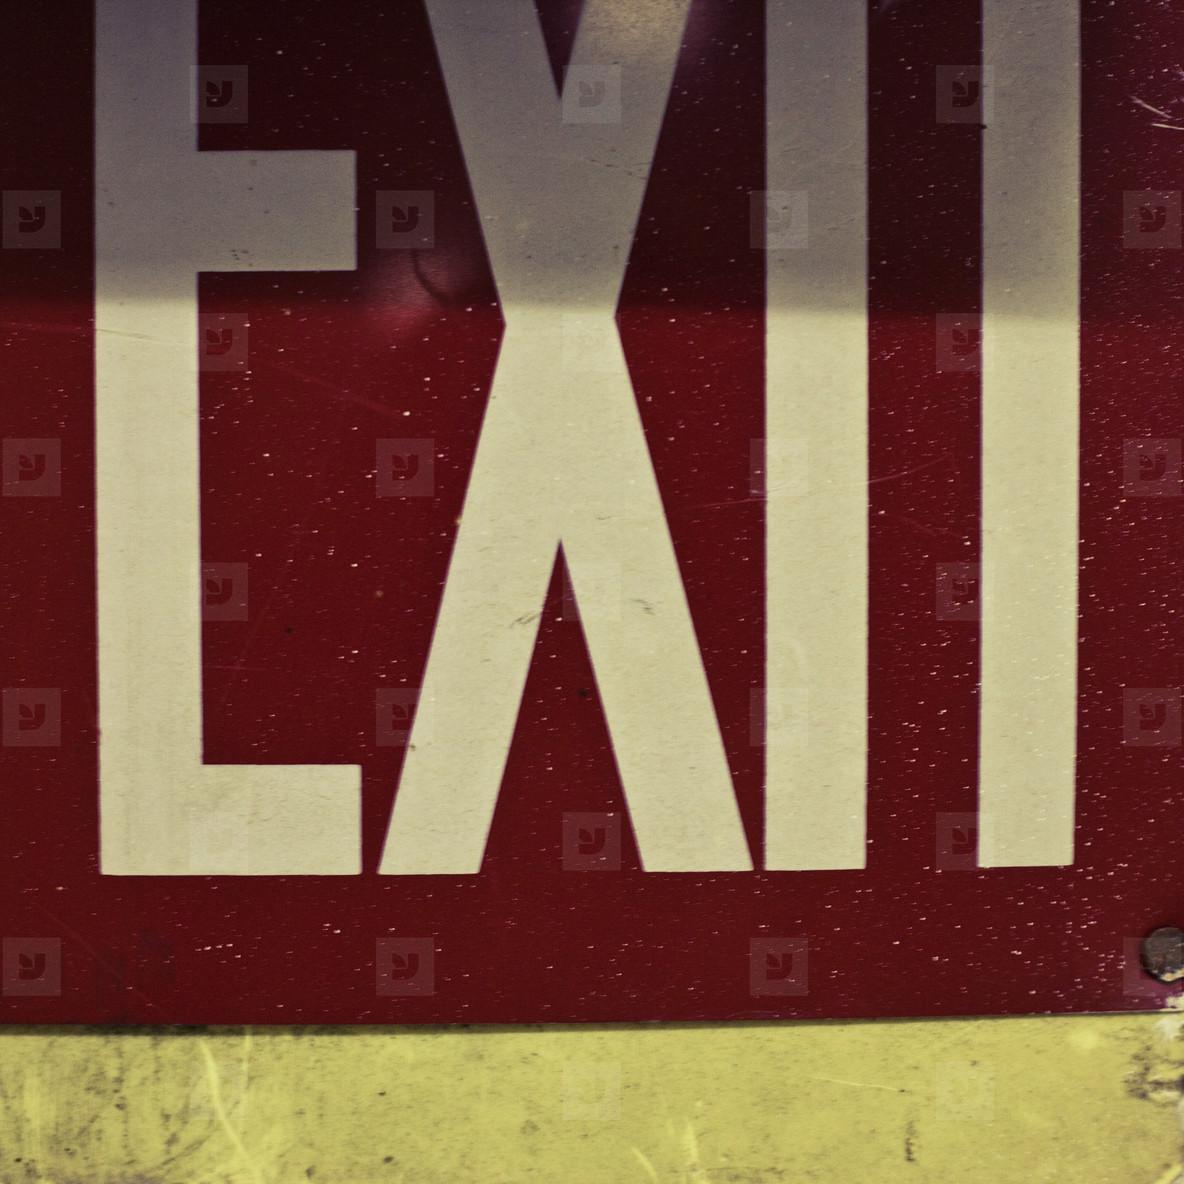 Exit sign up close